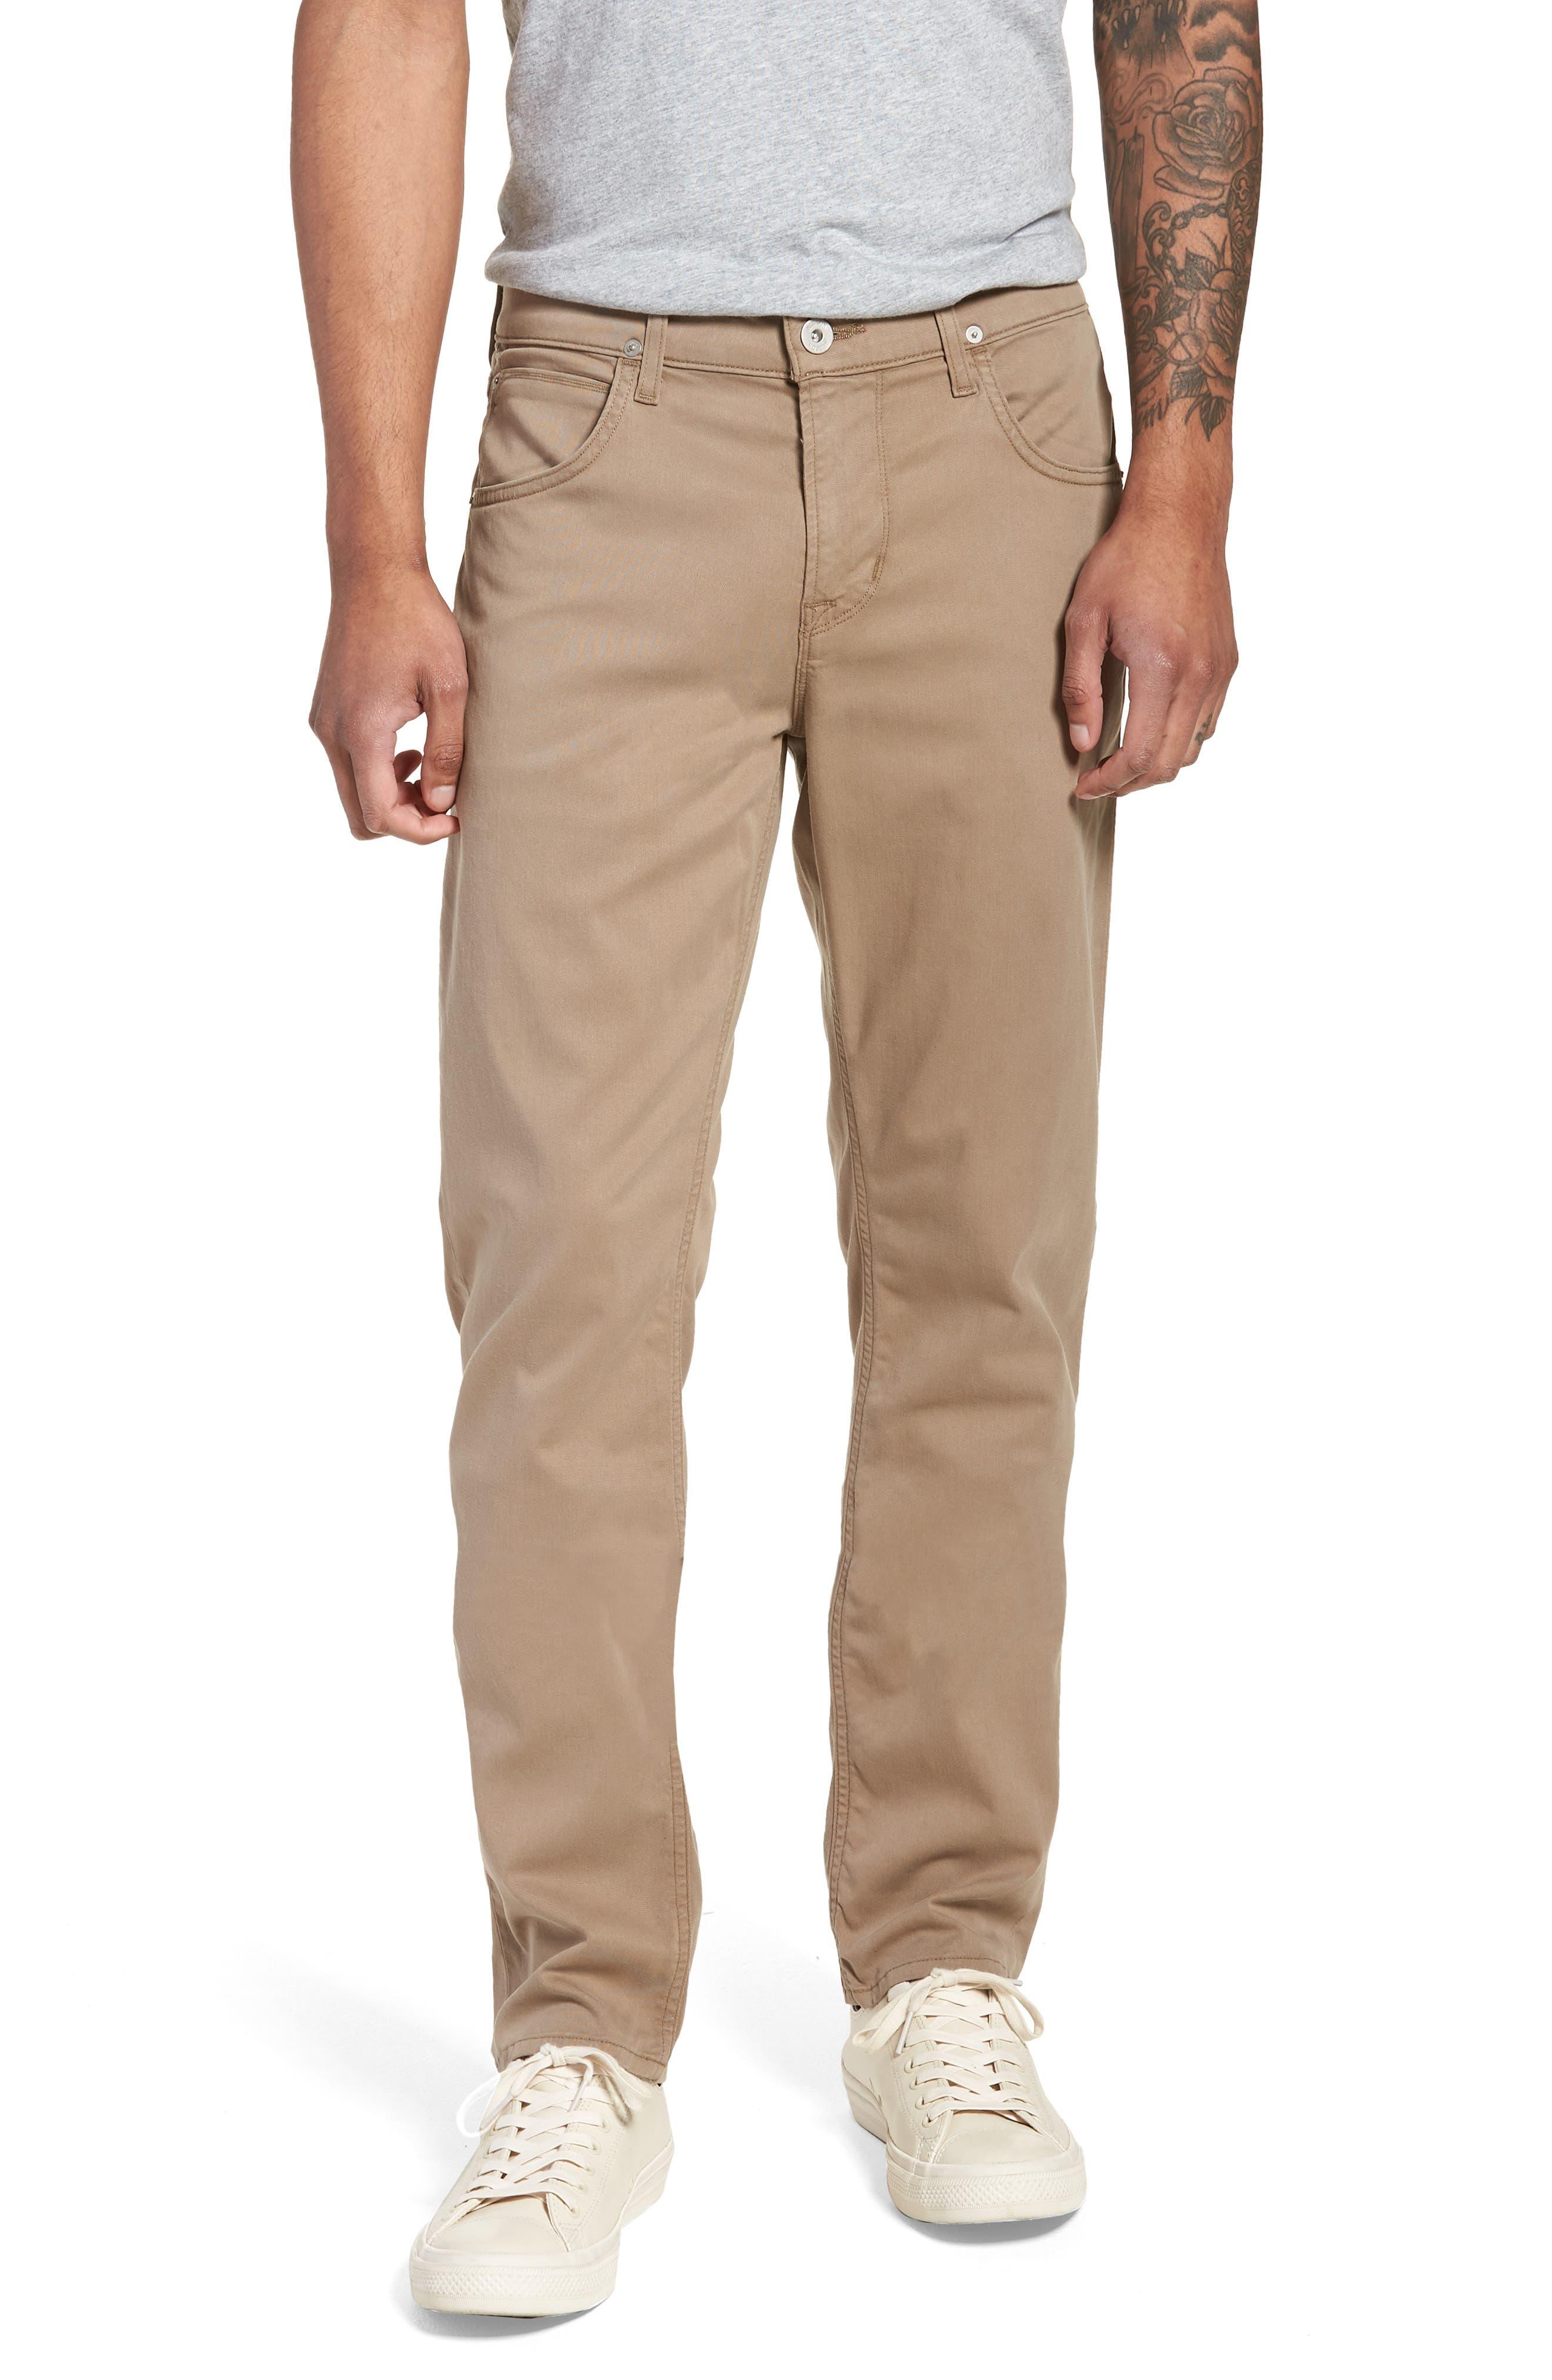 Blake Slim Fit Jeans,                         Main,                         color, Sandman